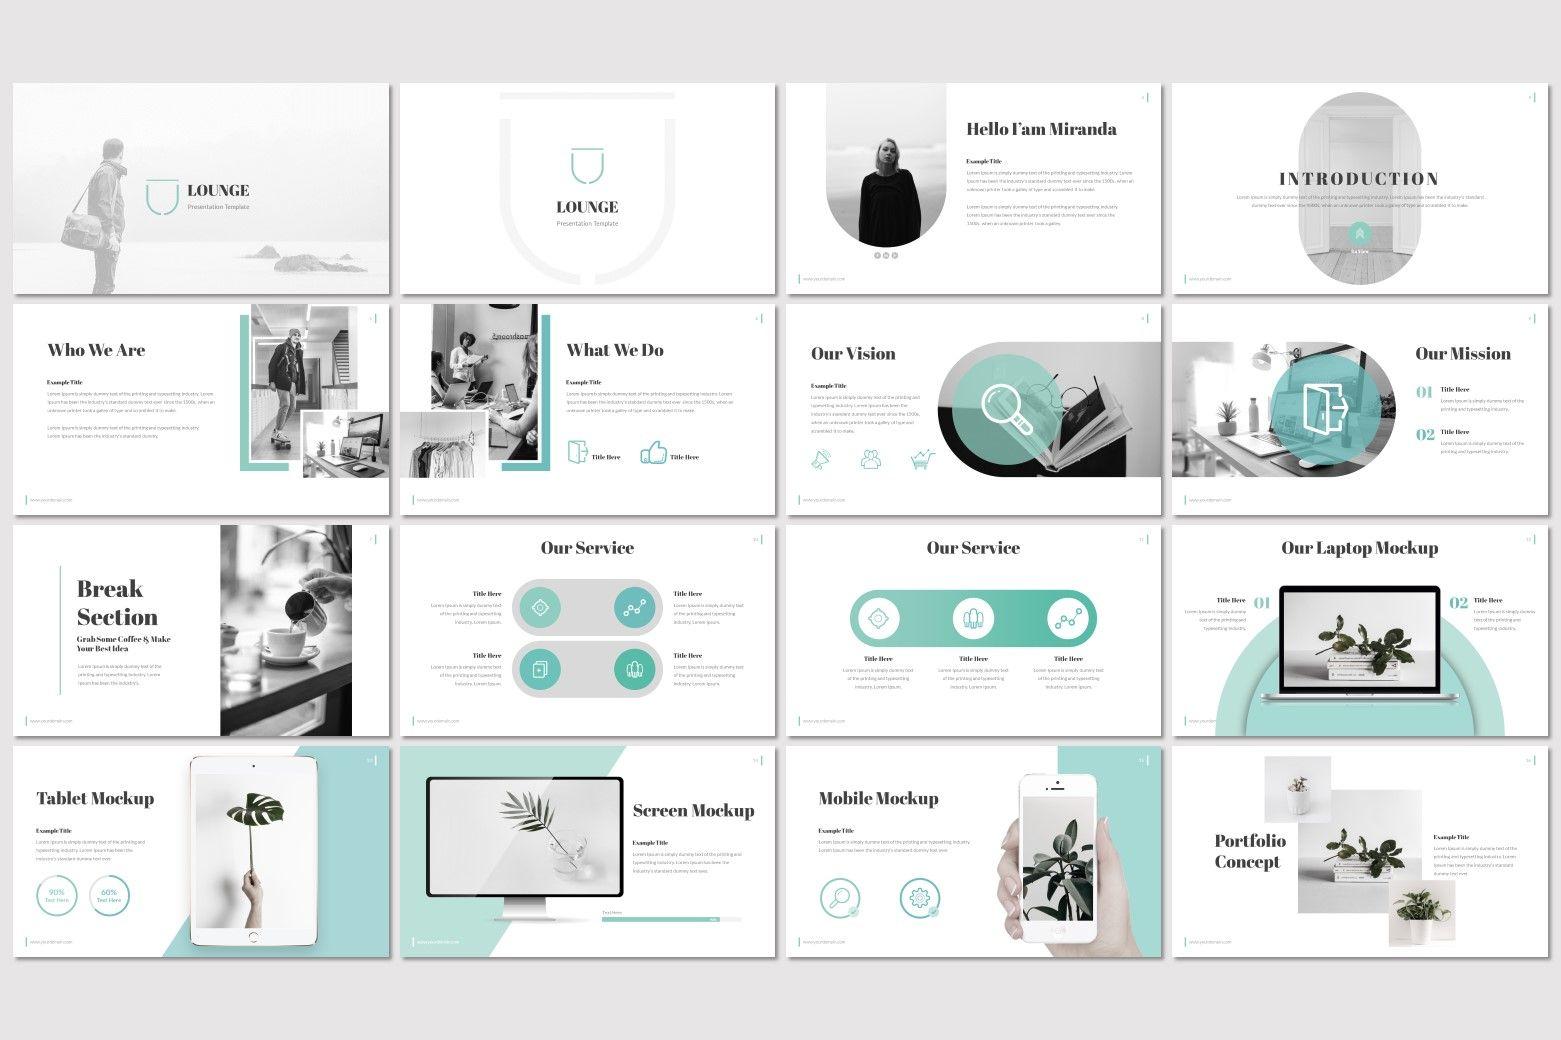 Lounge - PowerPoint Template, Slide 2, 07244, Presentation Templates — PoweredTemplate.com